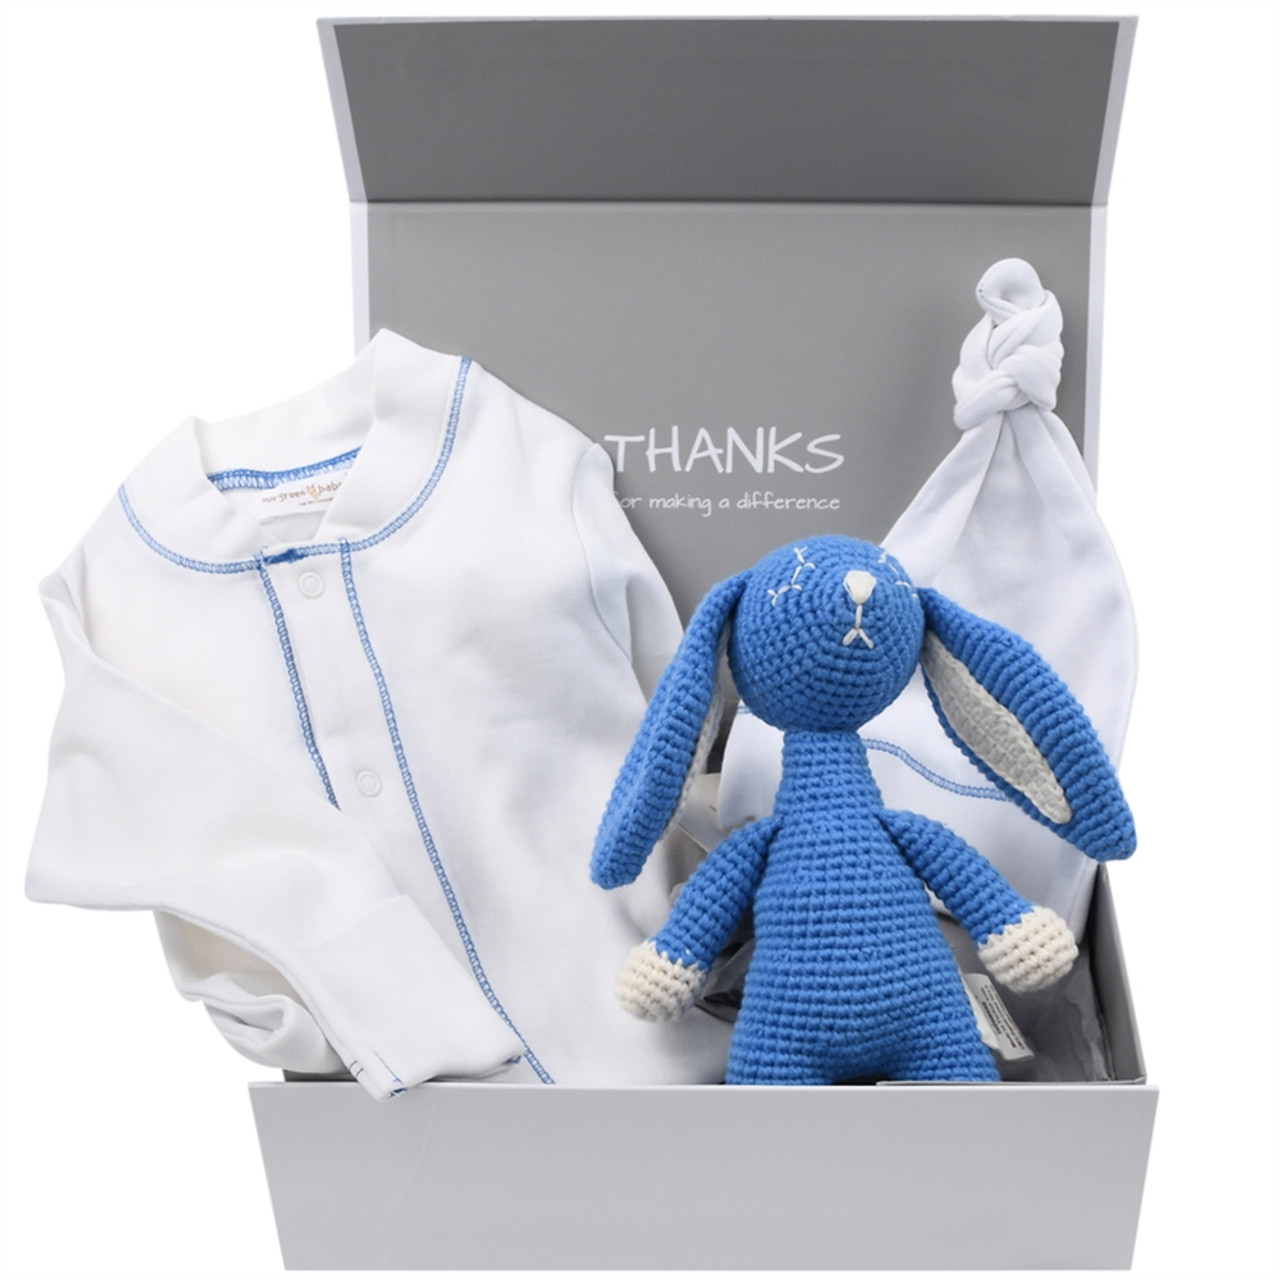 Organic Baby Gift Box - Welcome Baby Boy